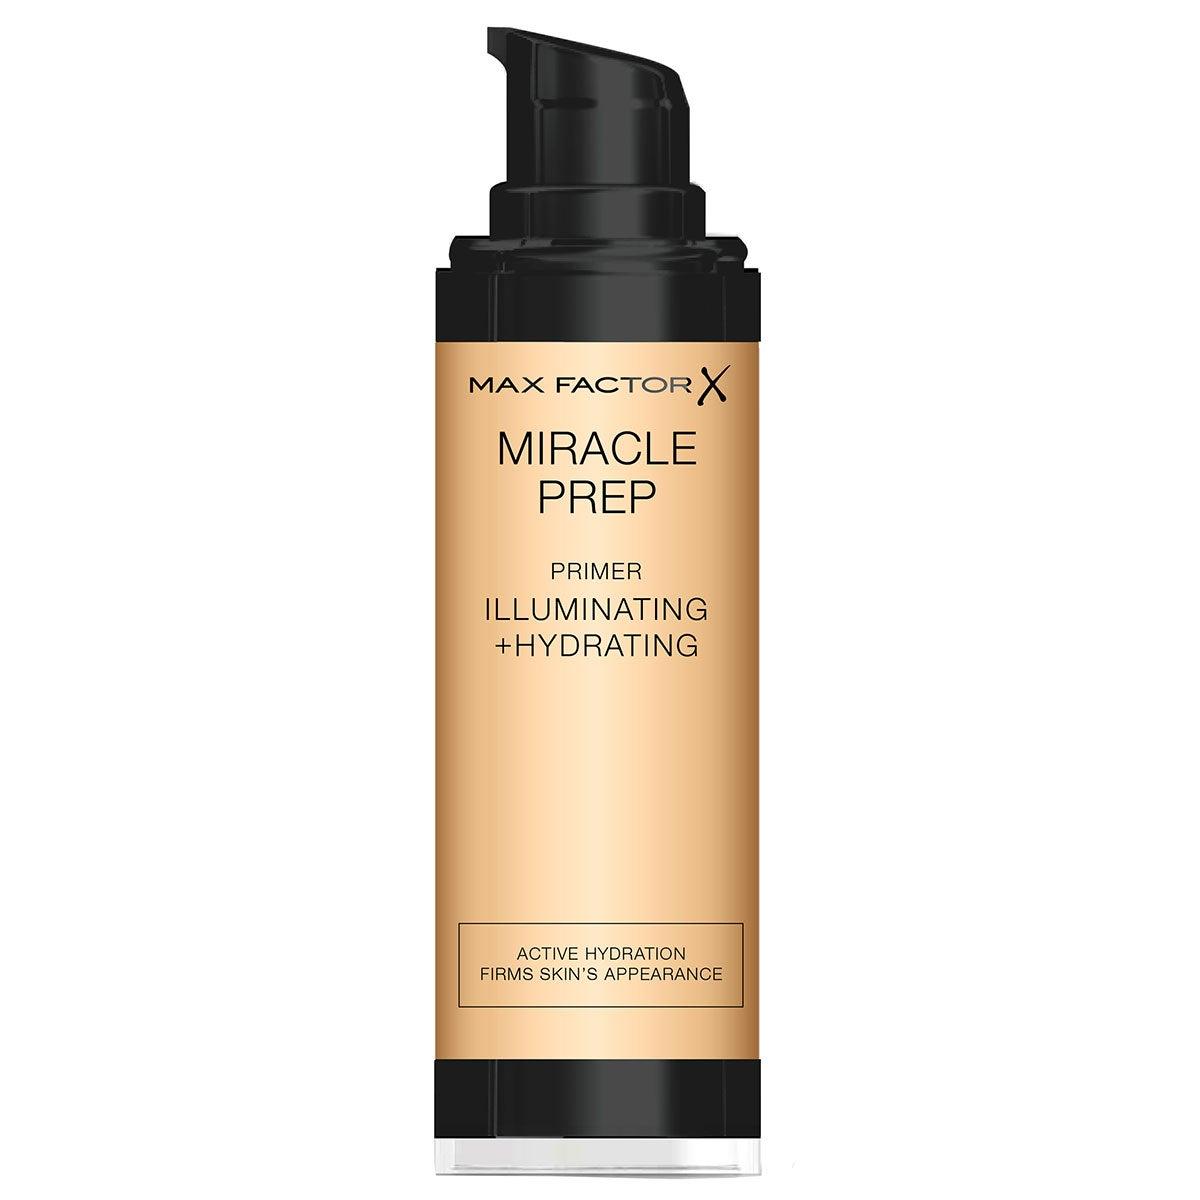 Illuminating & Hydrating Primer 30 ml Max Factor Primer